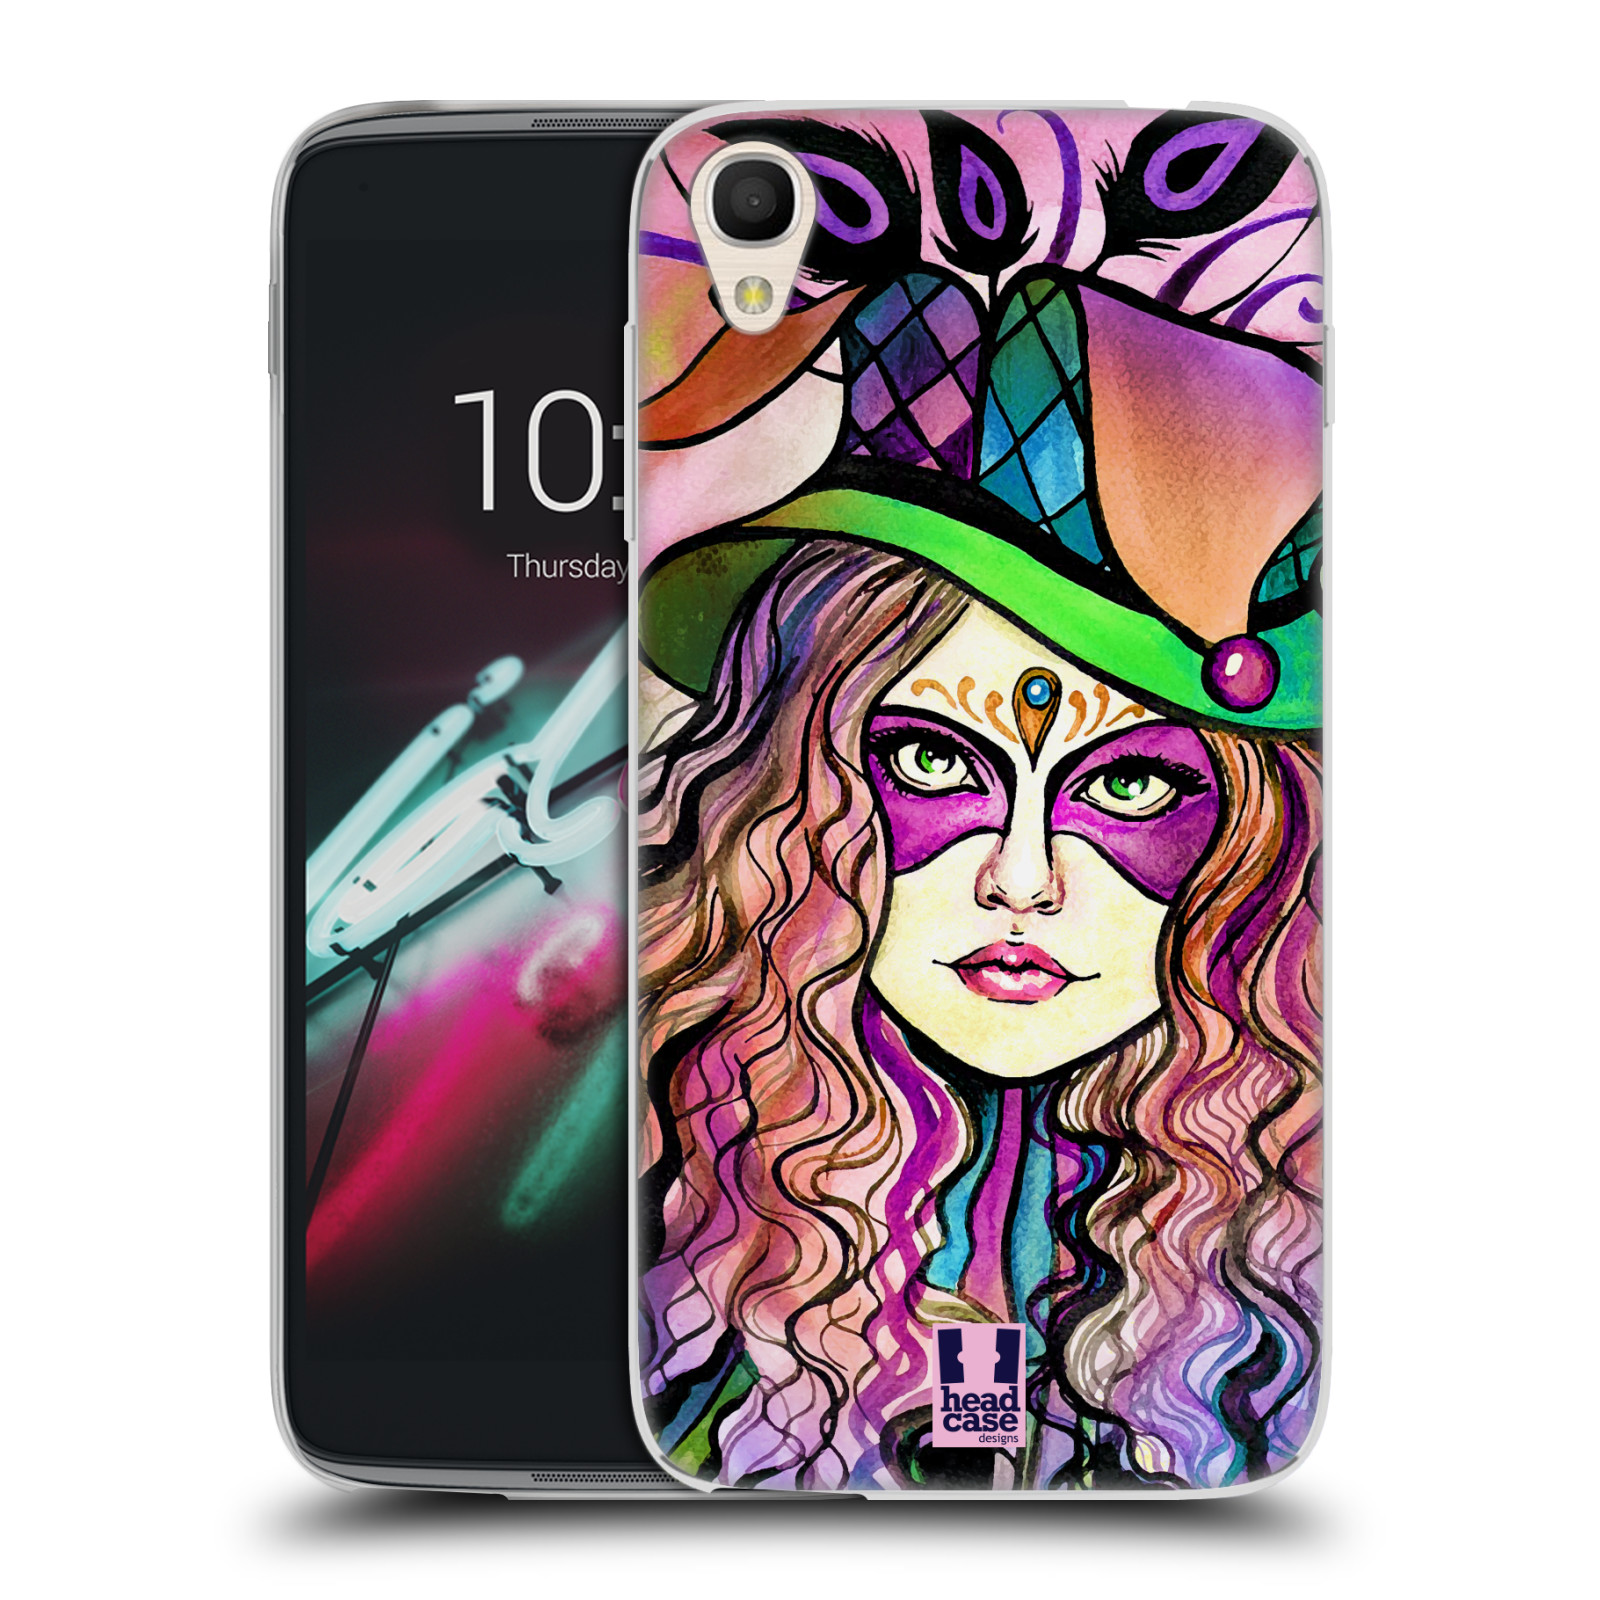 HEAD CASE silikonový obal na mobil Alcatel Idol 3 OT-6039Y (4.7) vzor Maškarní ples masky kreslené vzory KLOBOUK